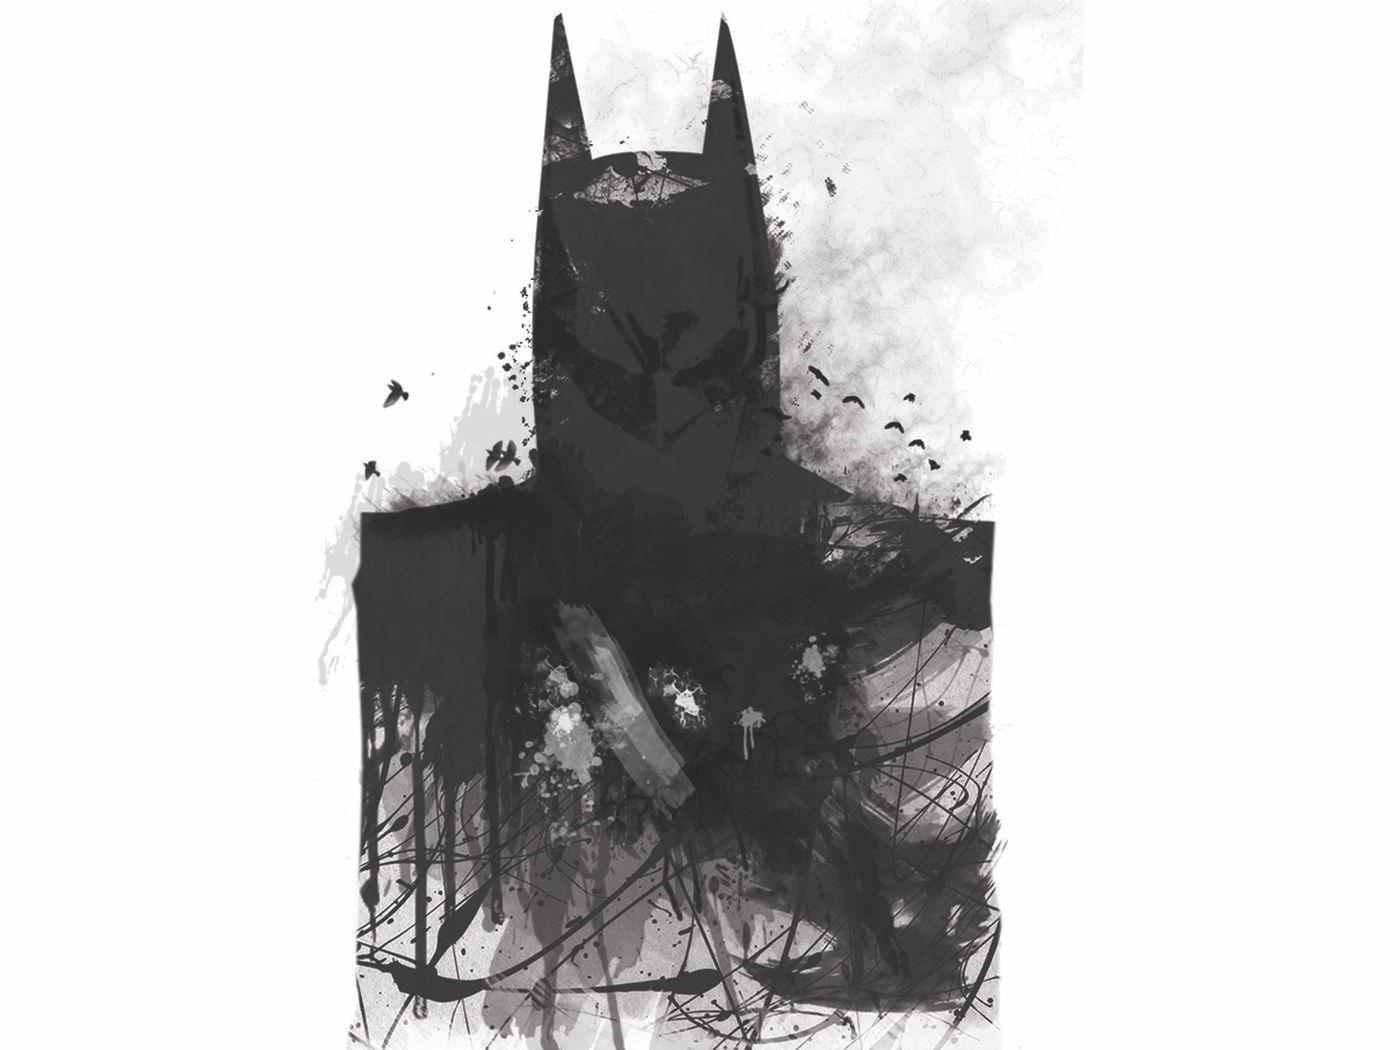 Spotify's first exclusive DC Comics podcast, Batman Unburied, explores  Bruce Wayne's psychology - The Verge